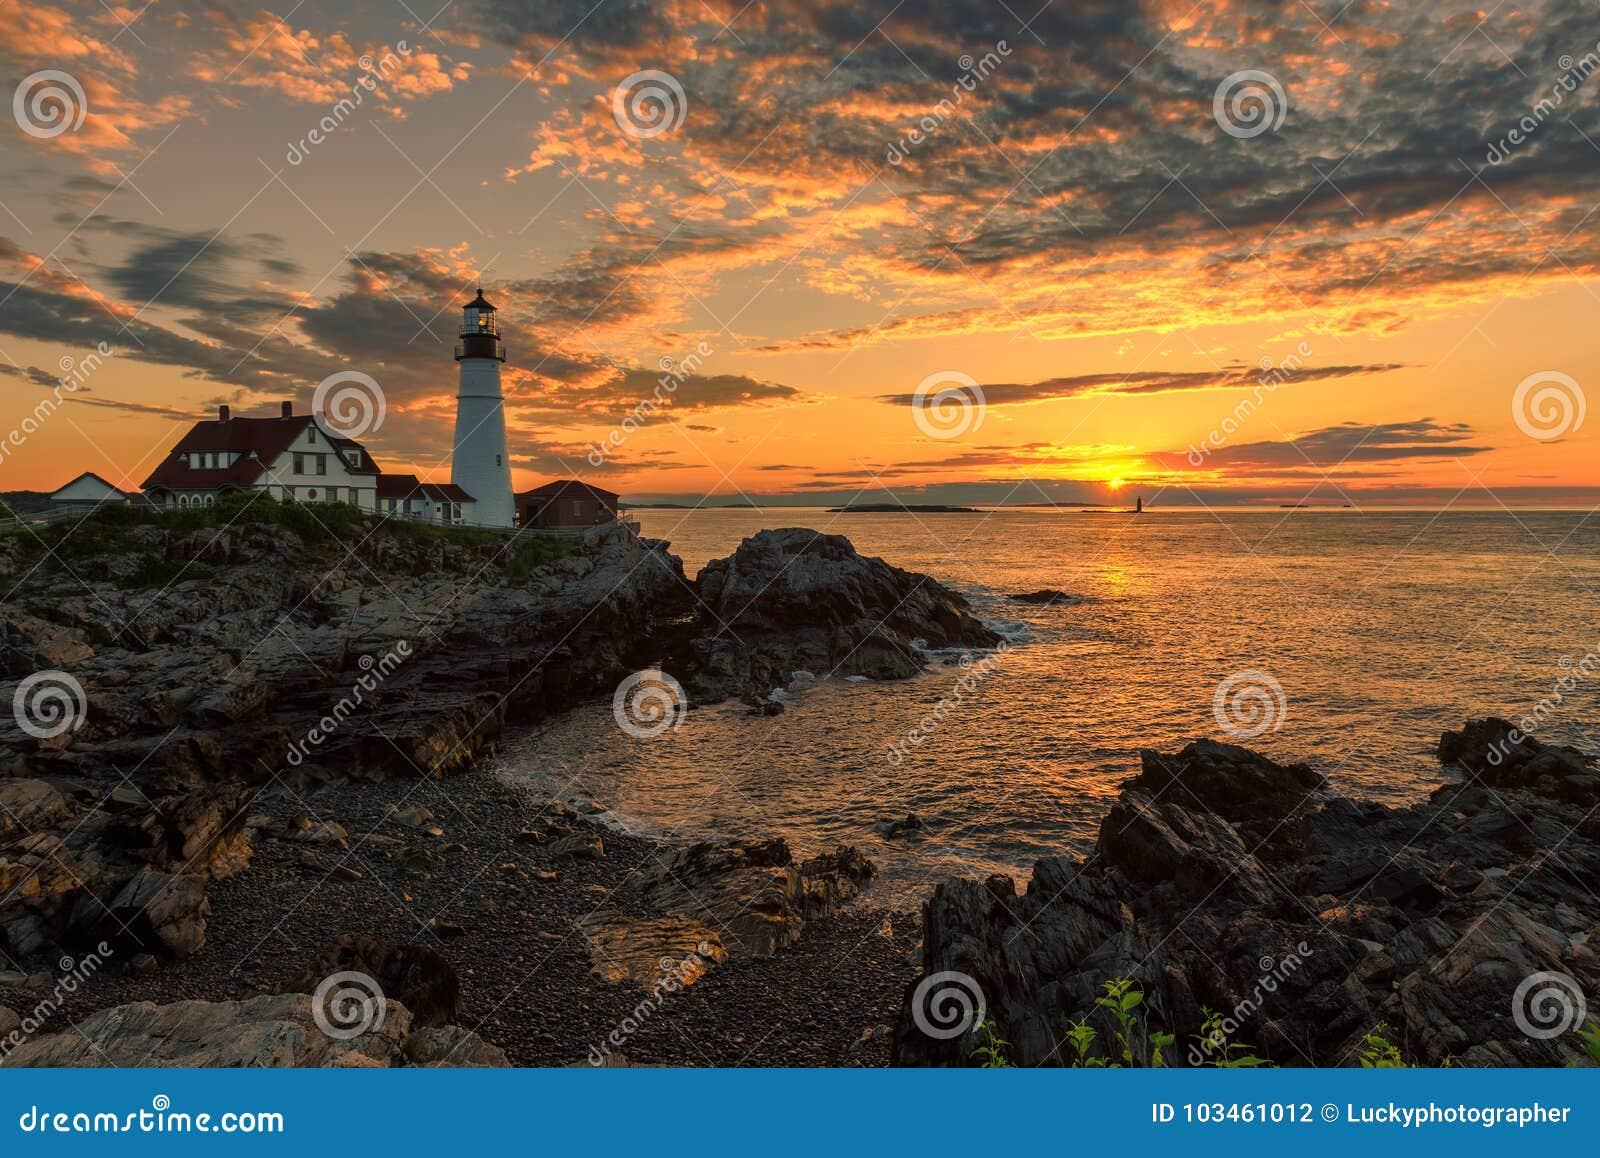 Portland Lighthouse at sunrise, Maine, USA